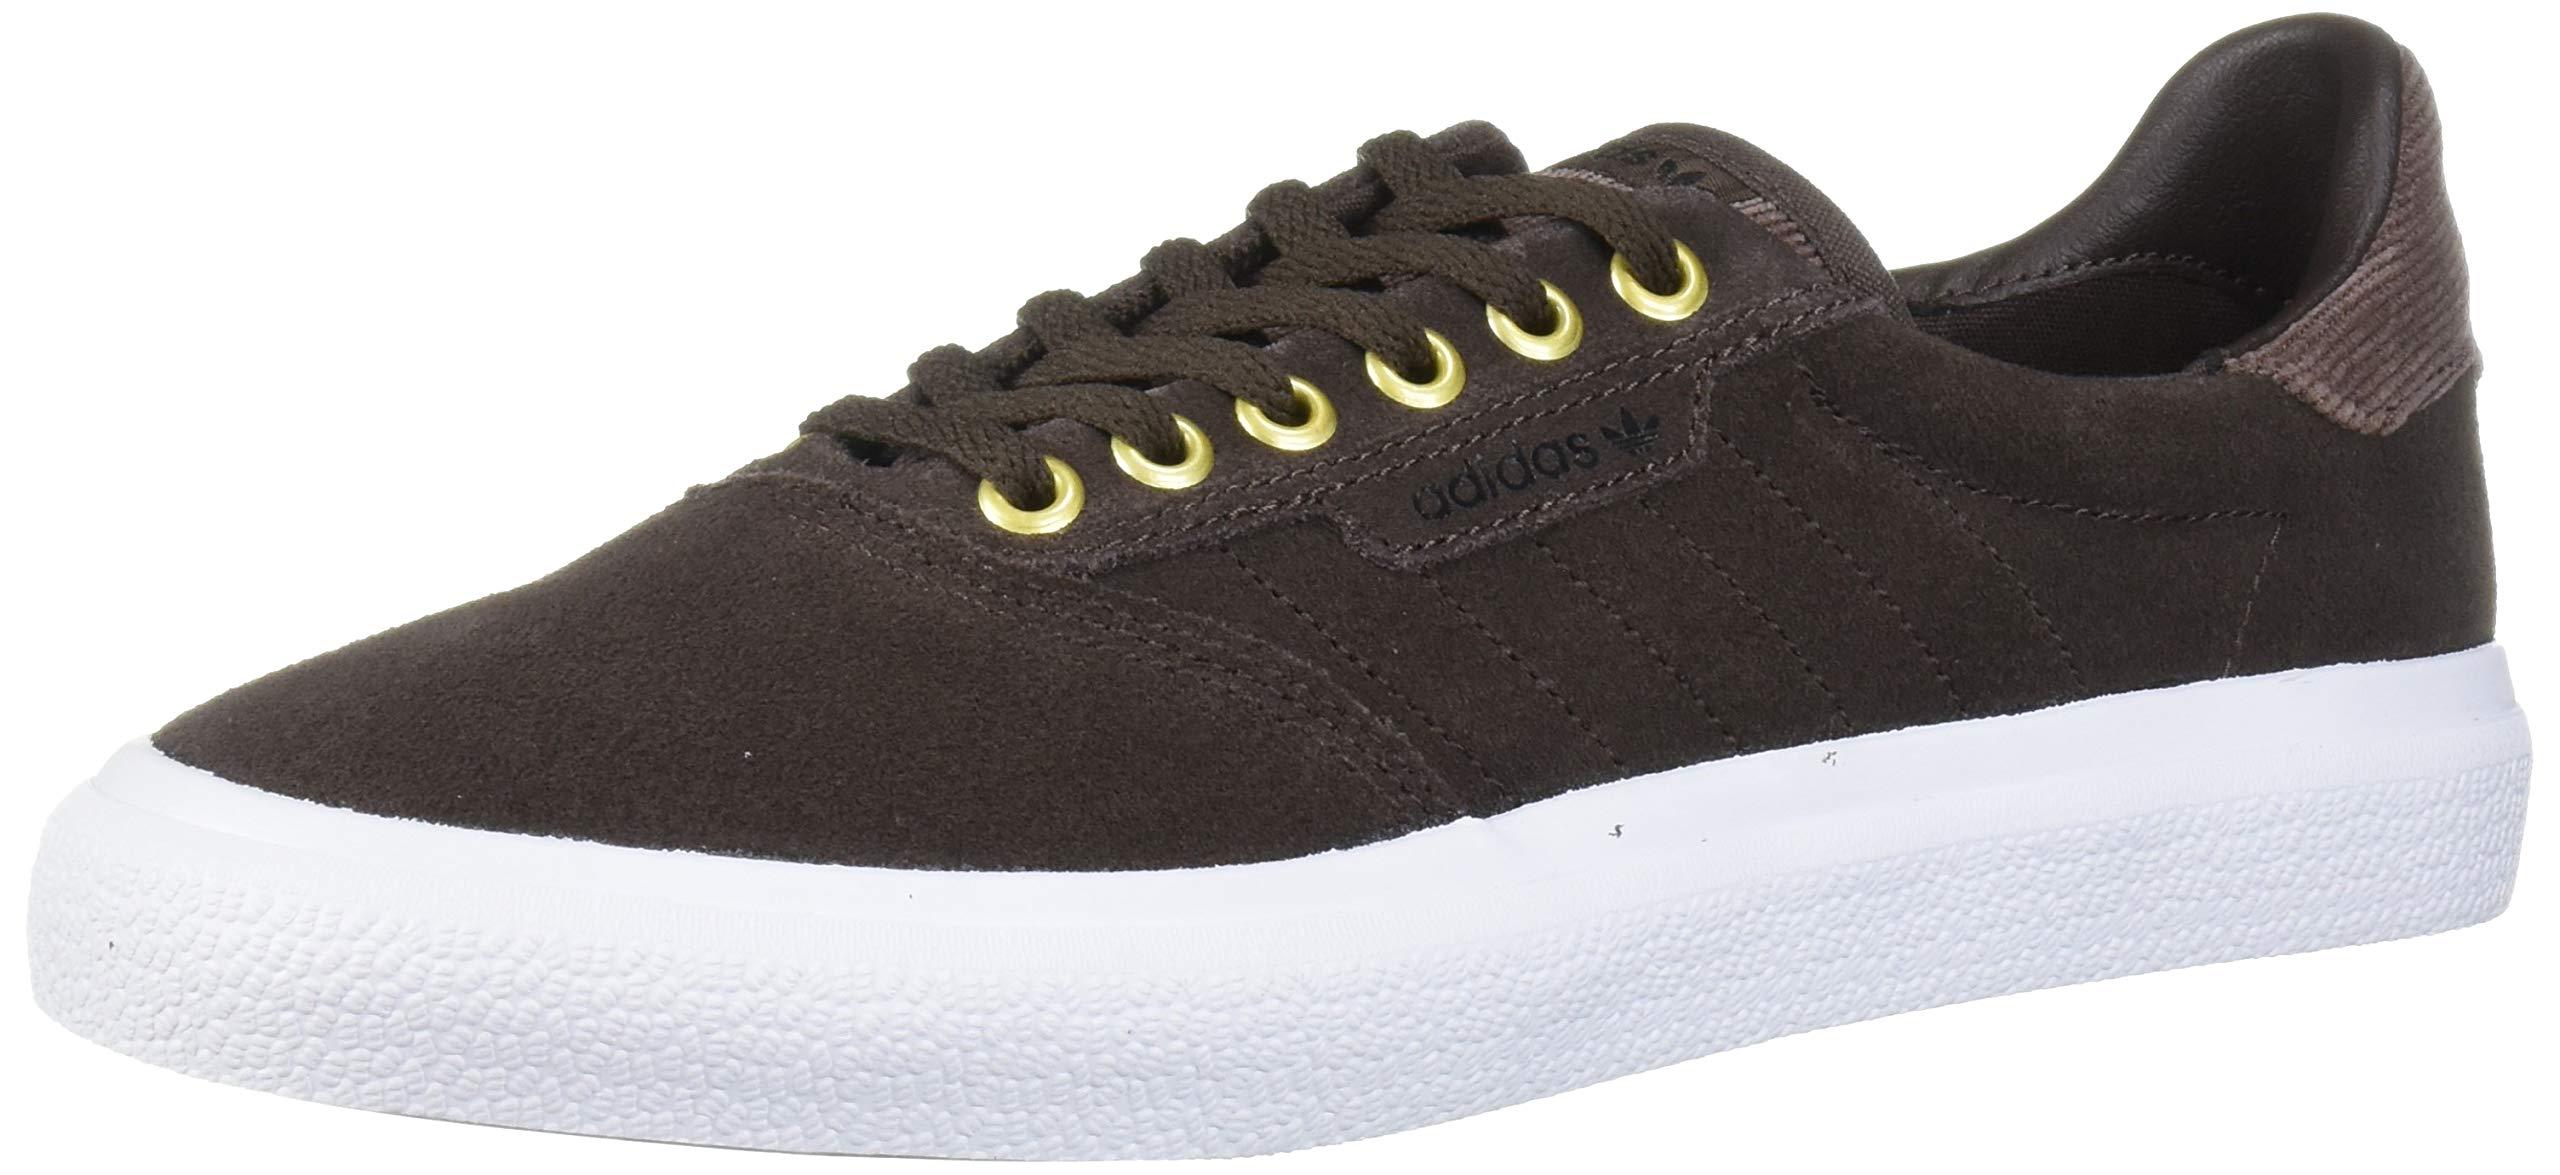 adidas Originals 3MC Sneaker, Brown/White/Gold